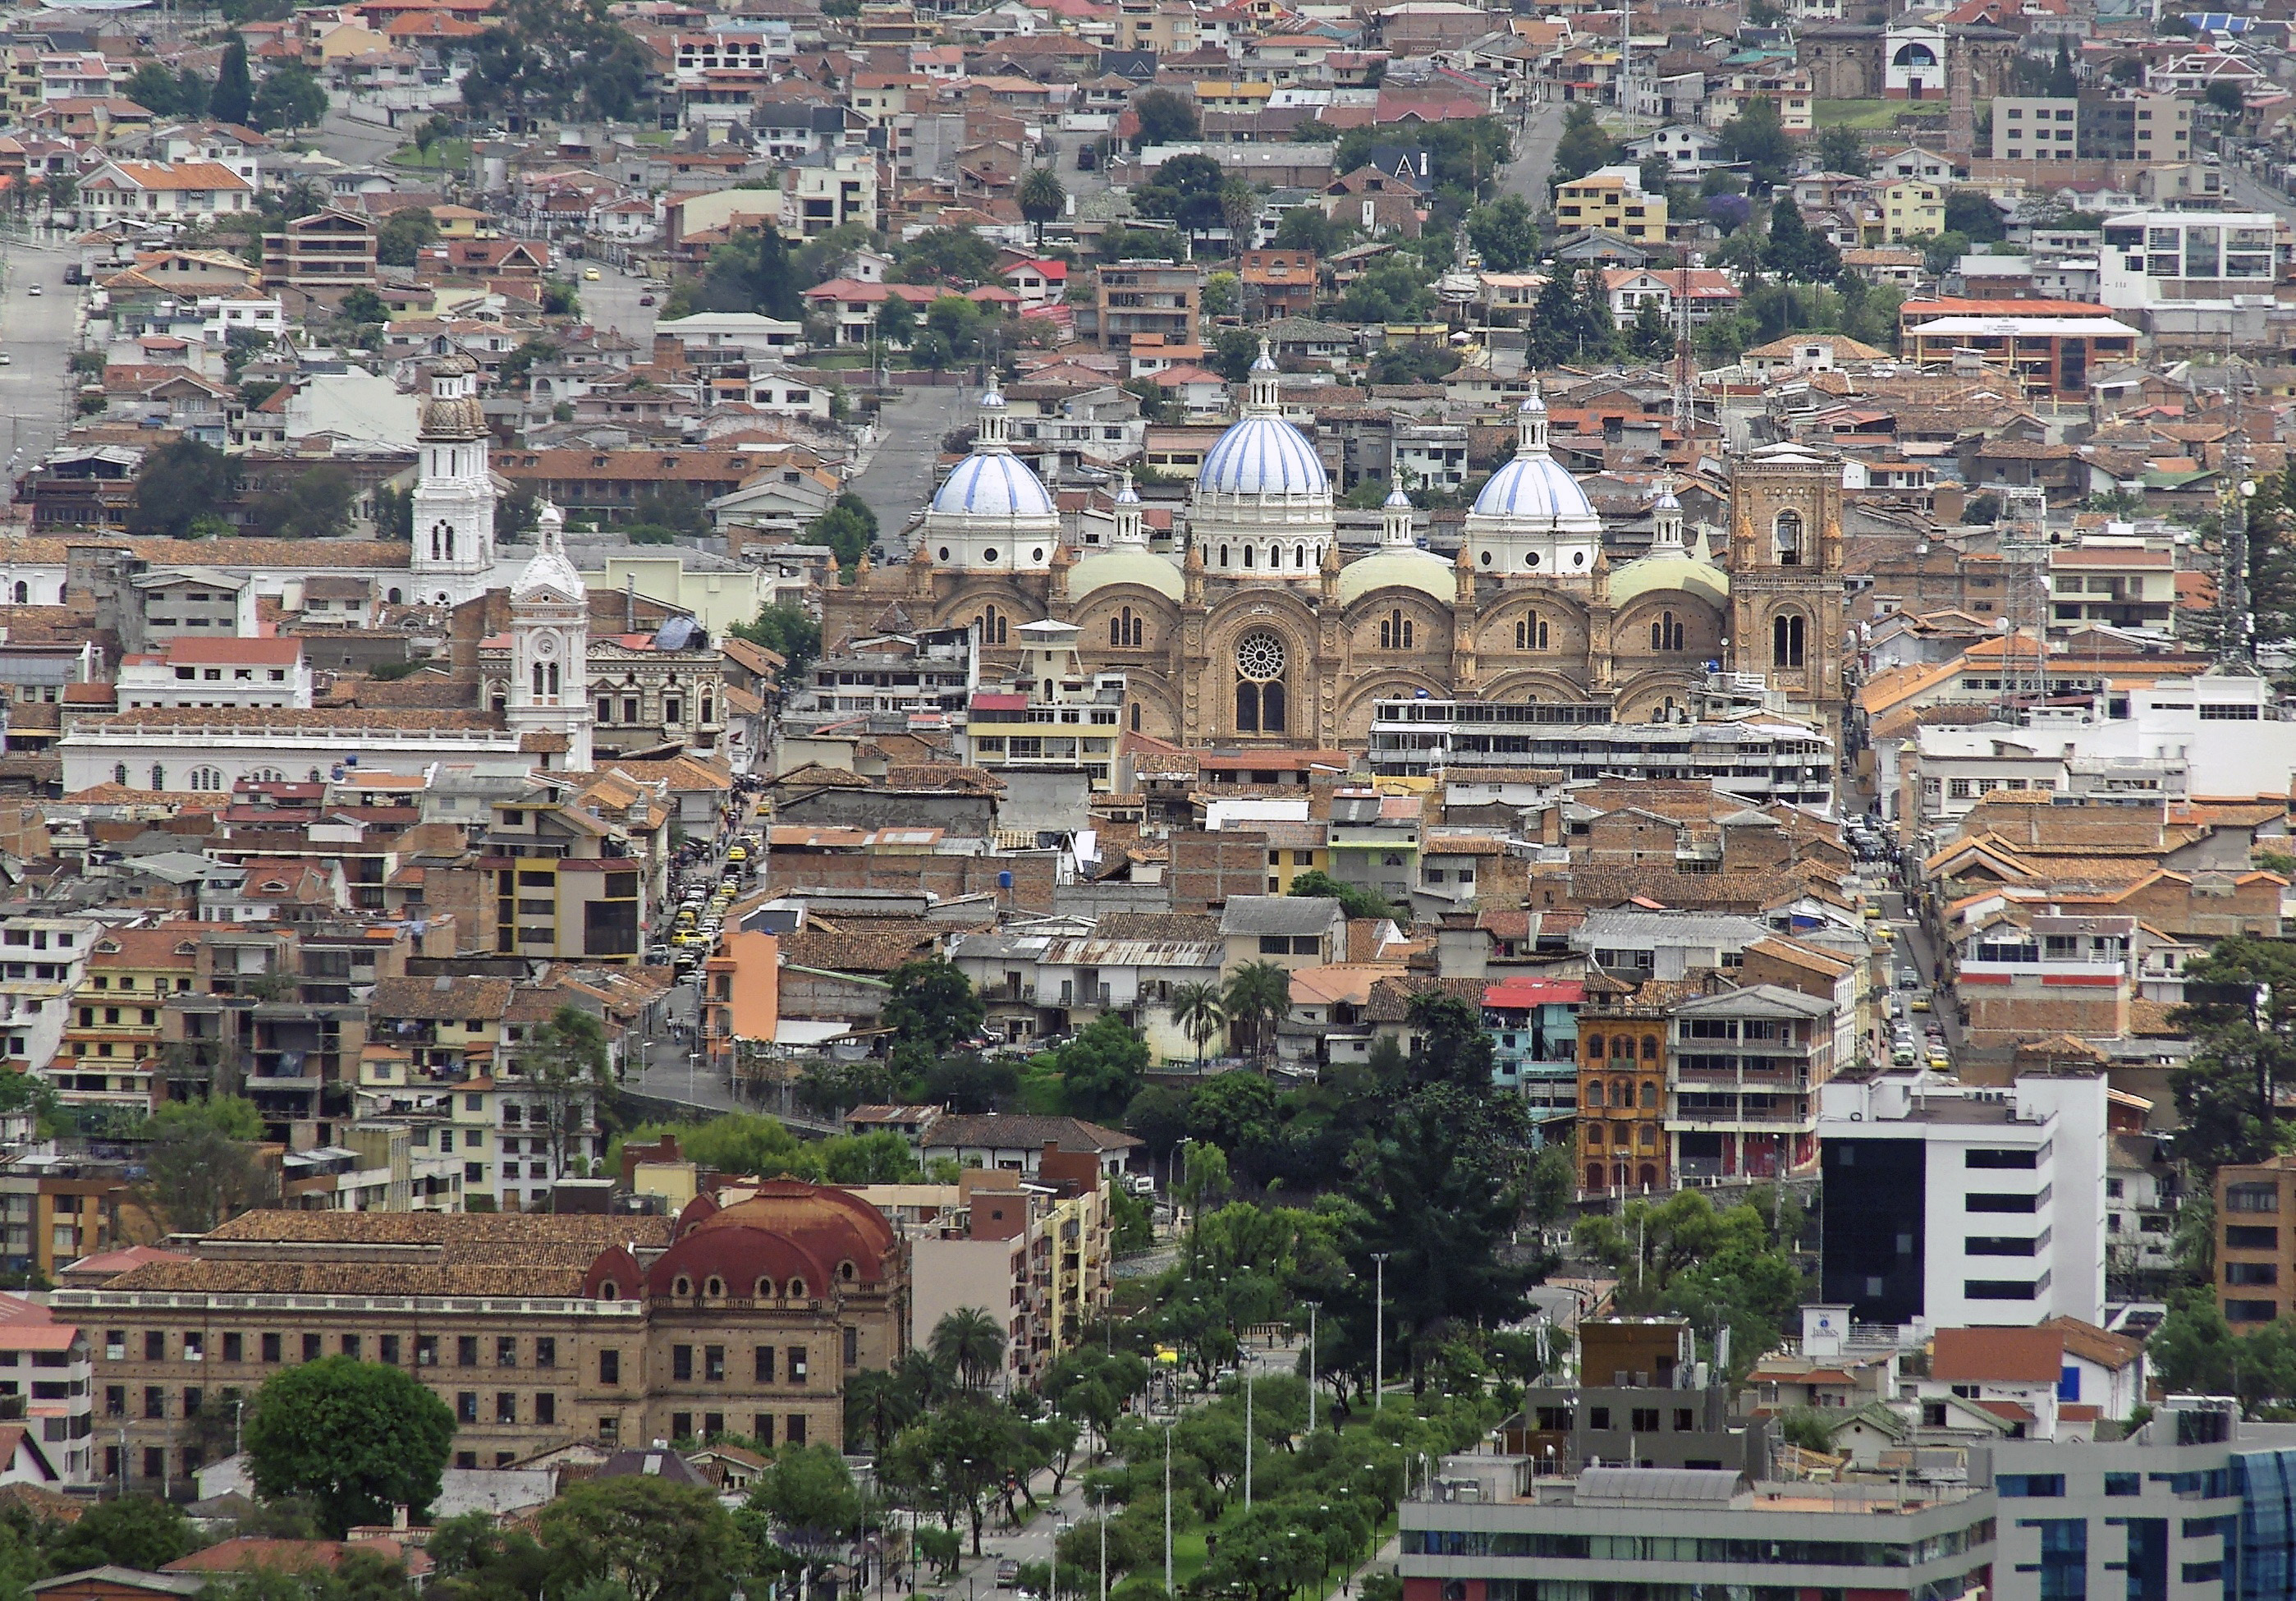 Blick auf die Stadt Cuenca in Ecuador